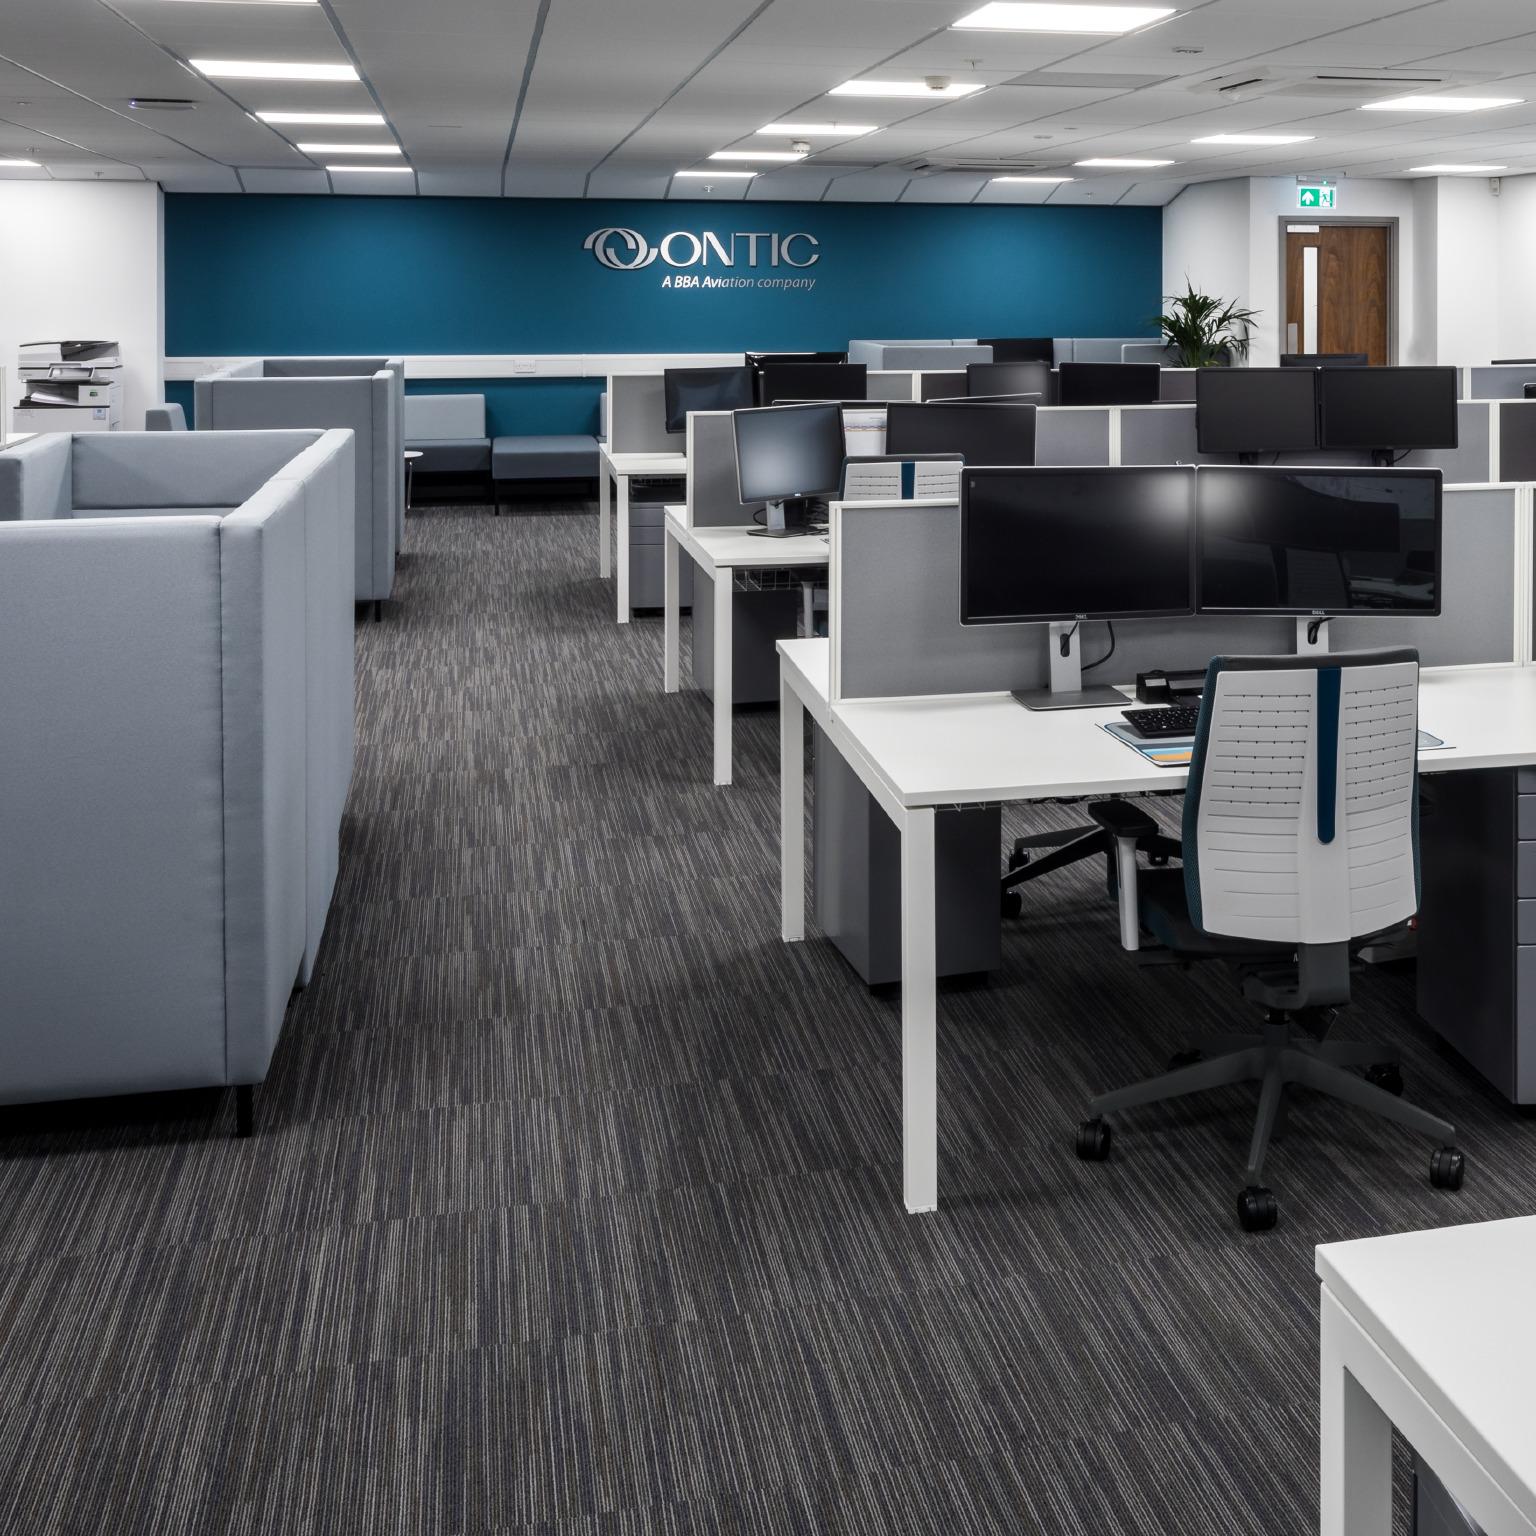 Ontic office desks.jpeg